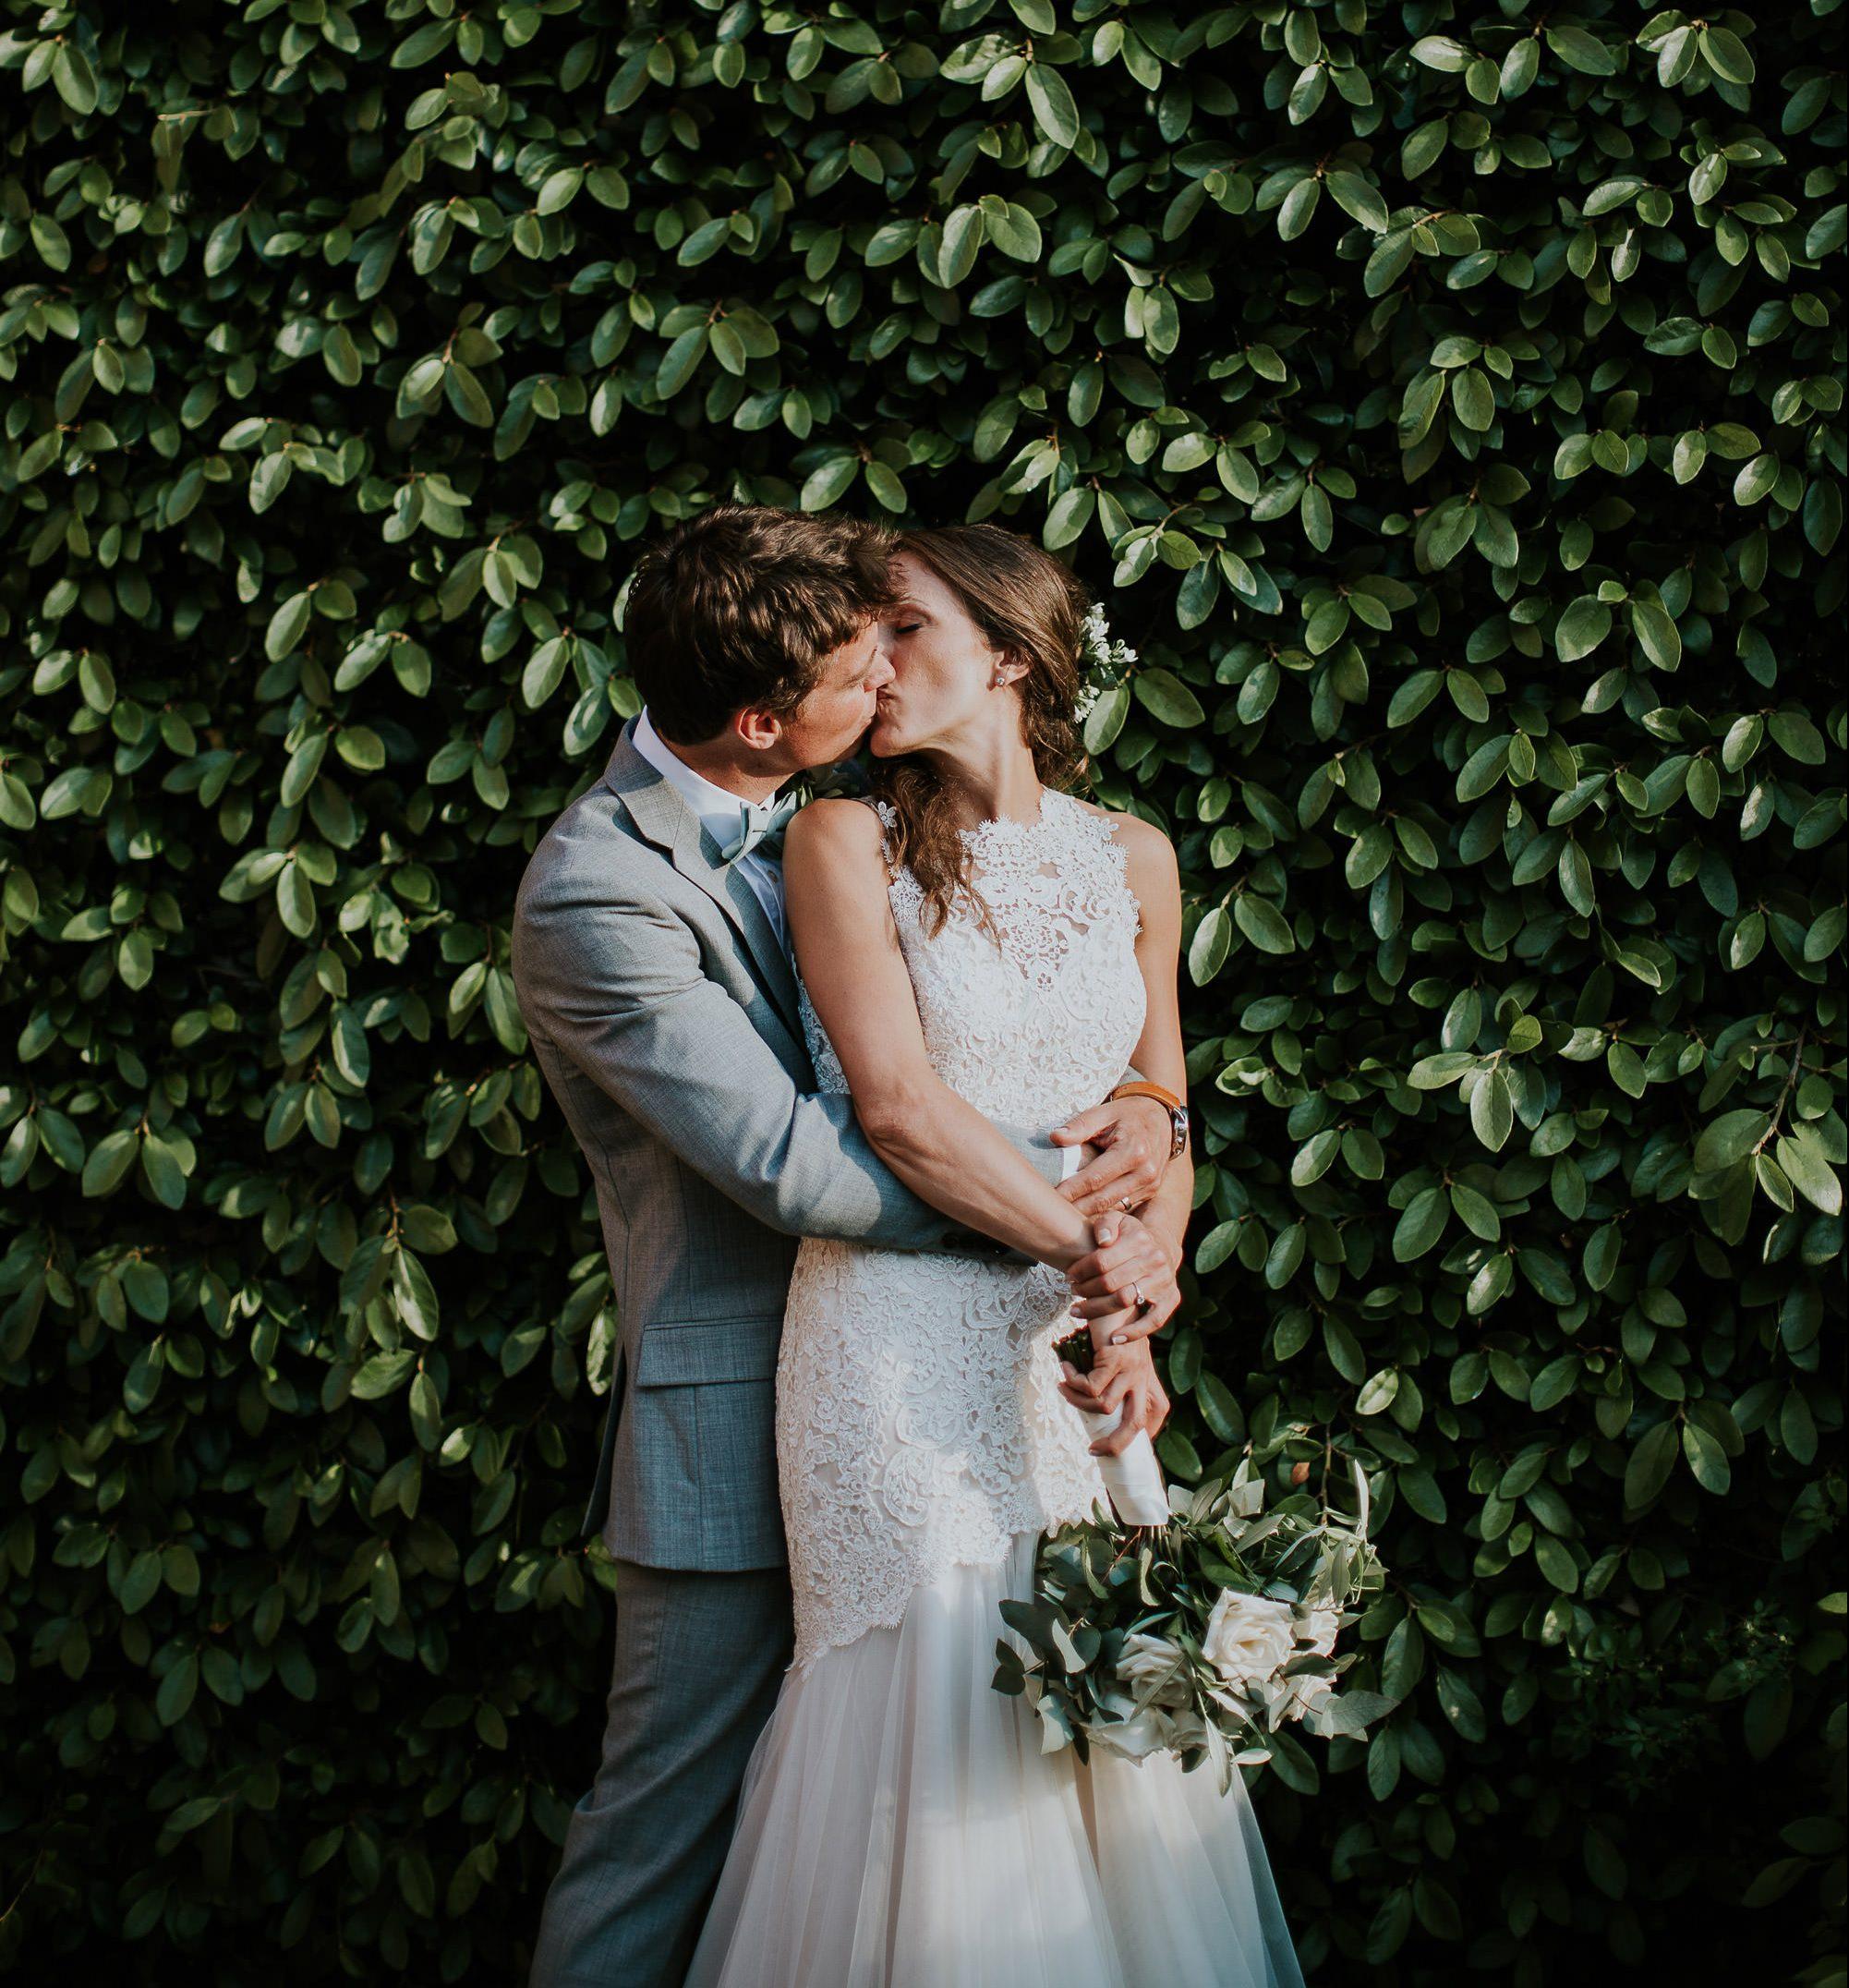 Monterosso al mare wedding dresses